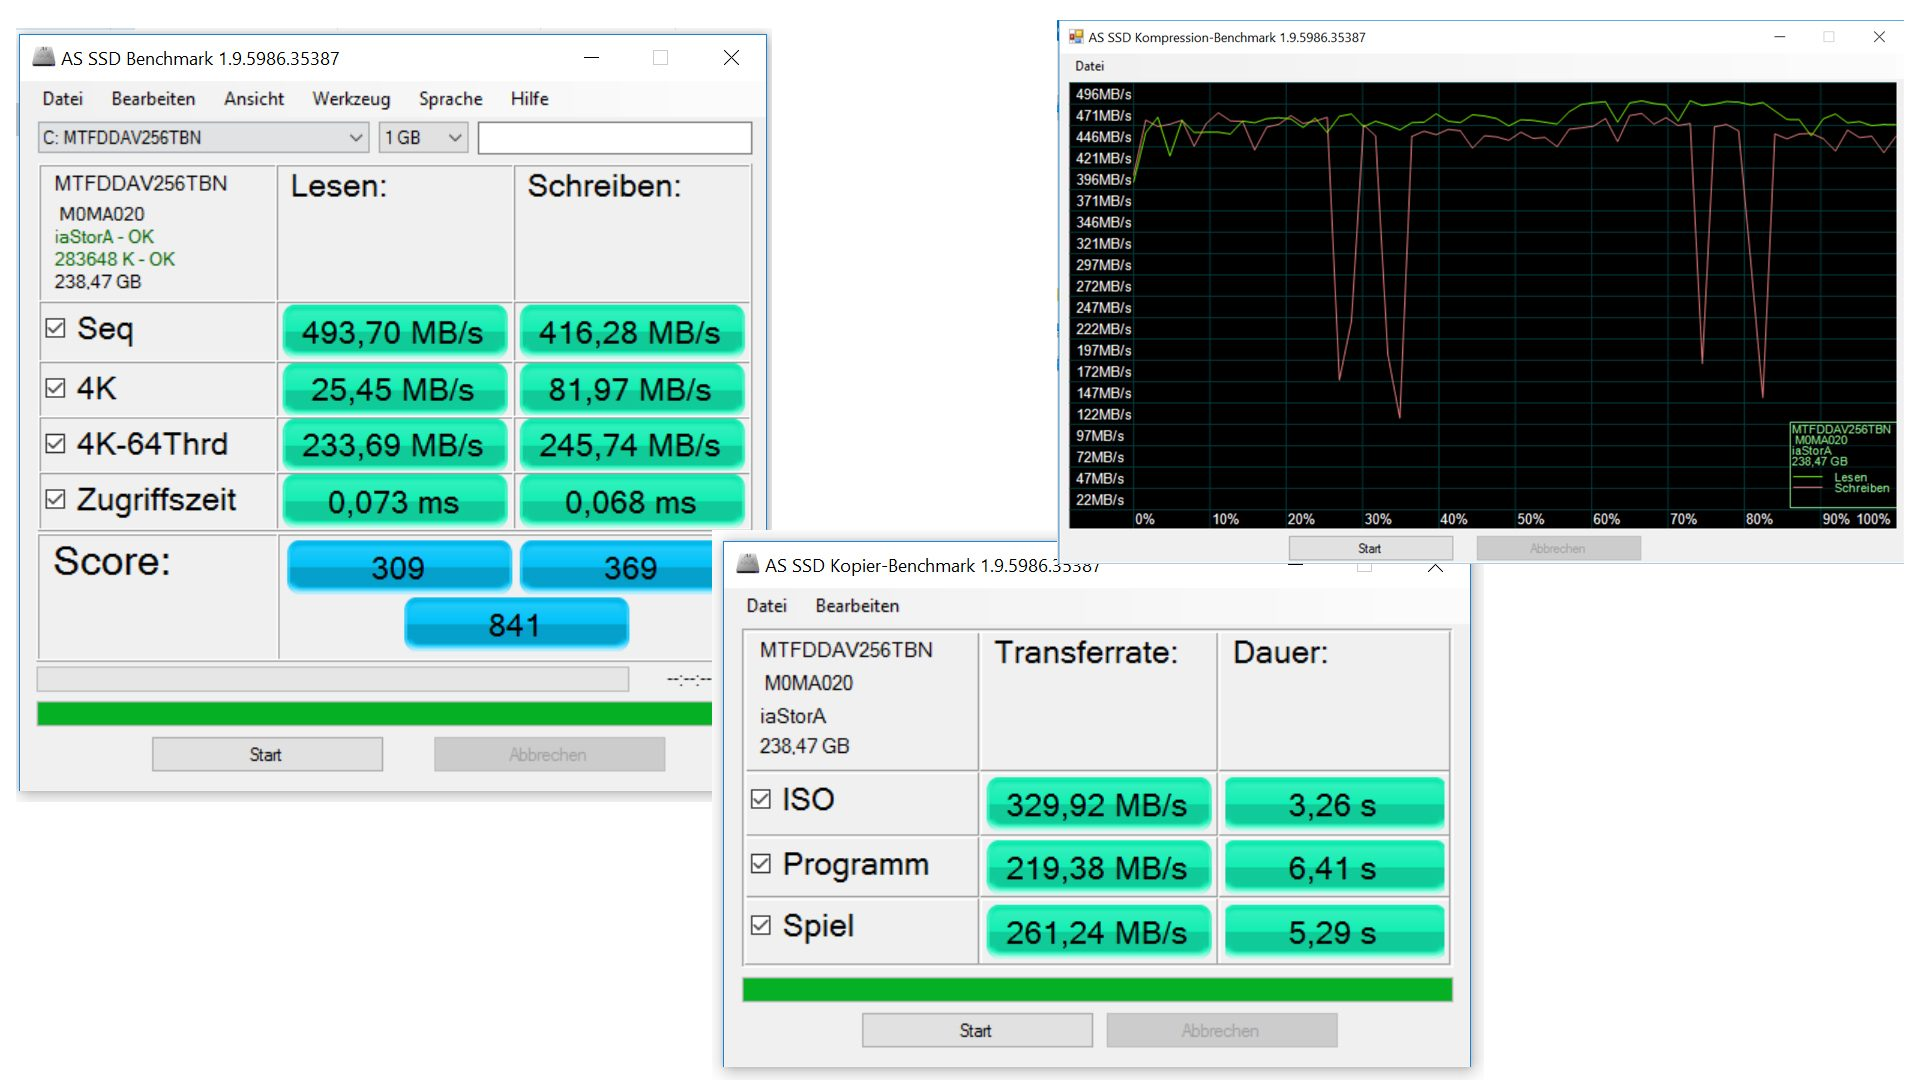 Asus Zenbook UX330UA-FC079T Benchmark_8